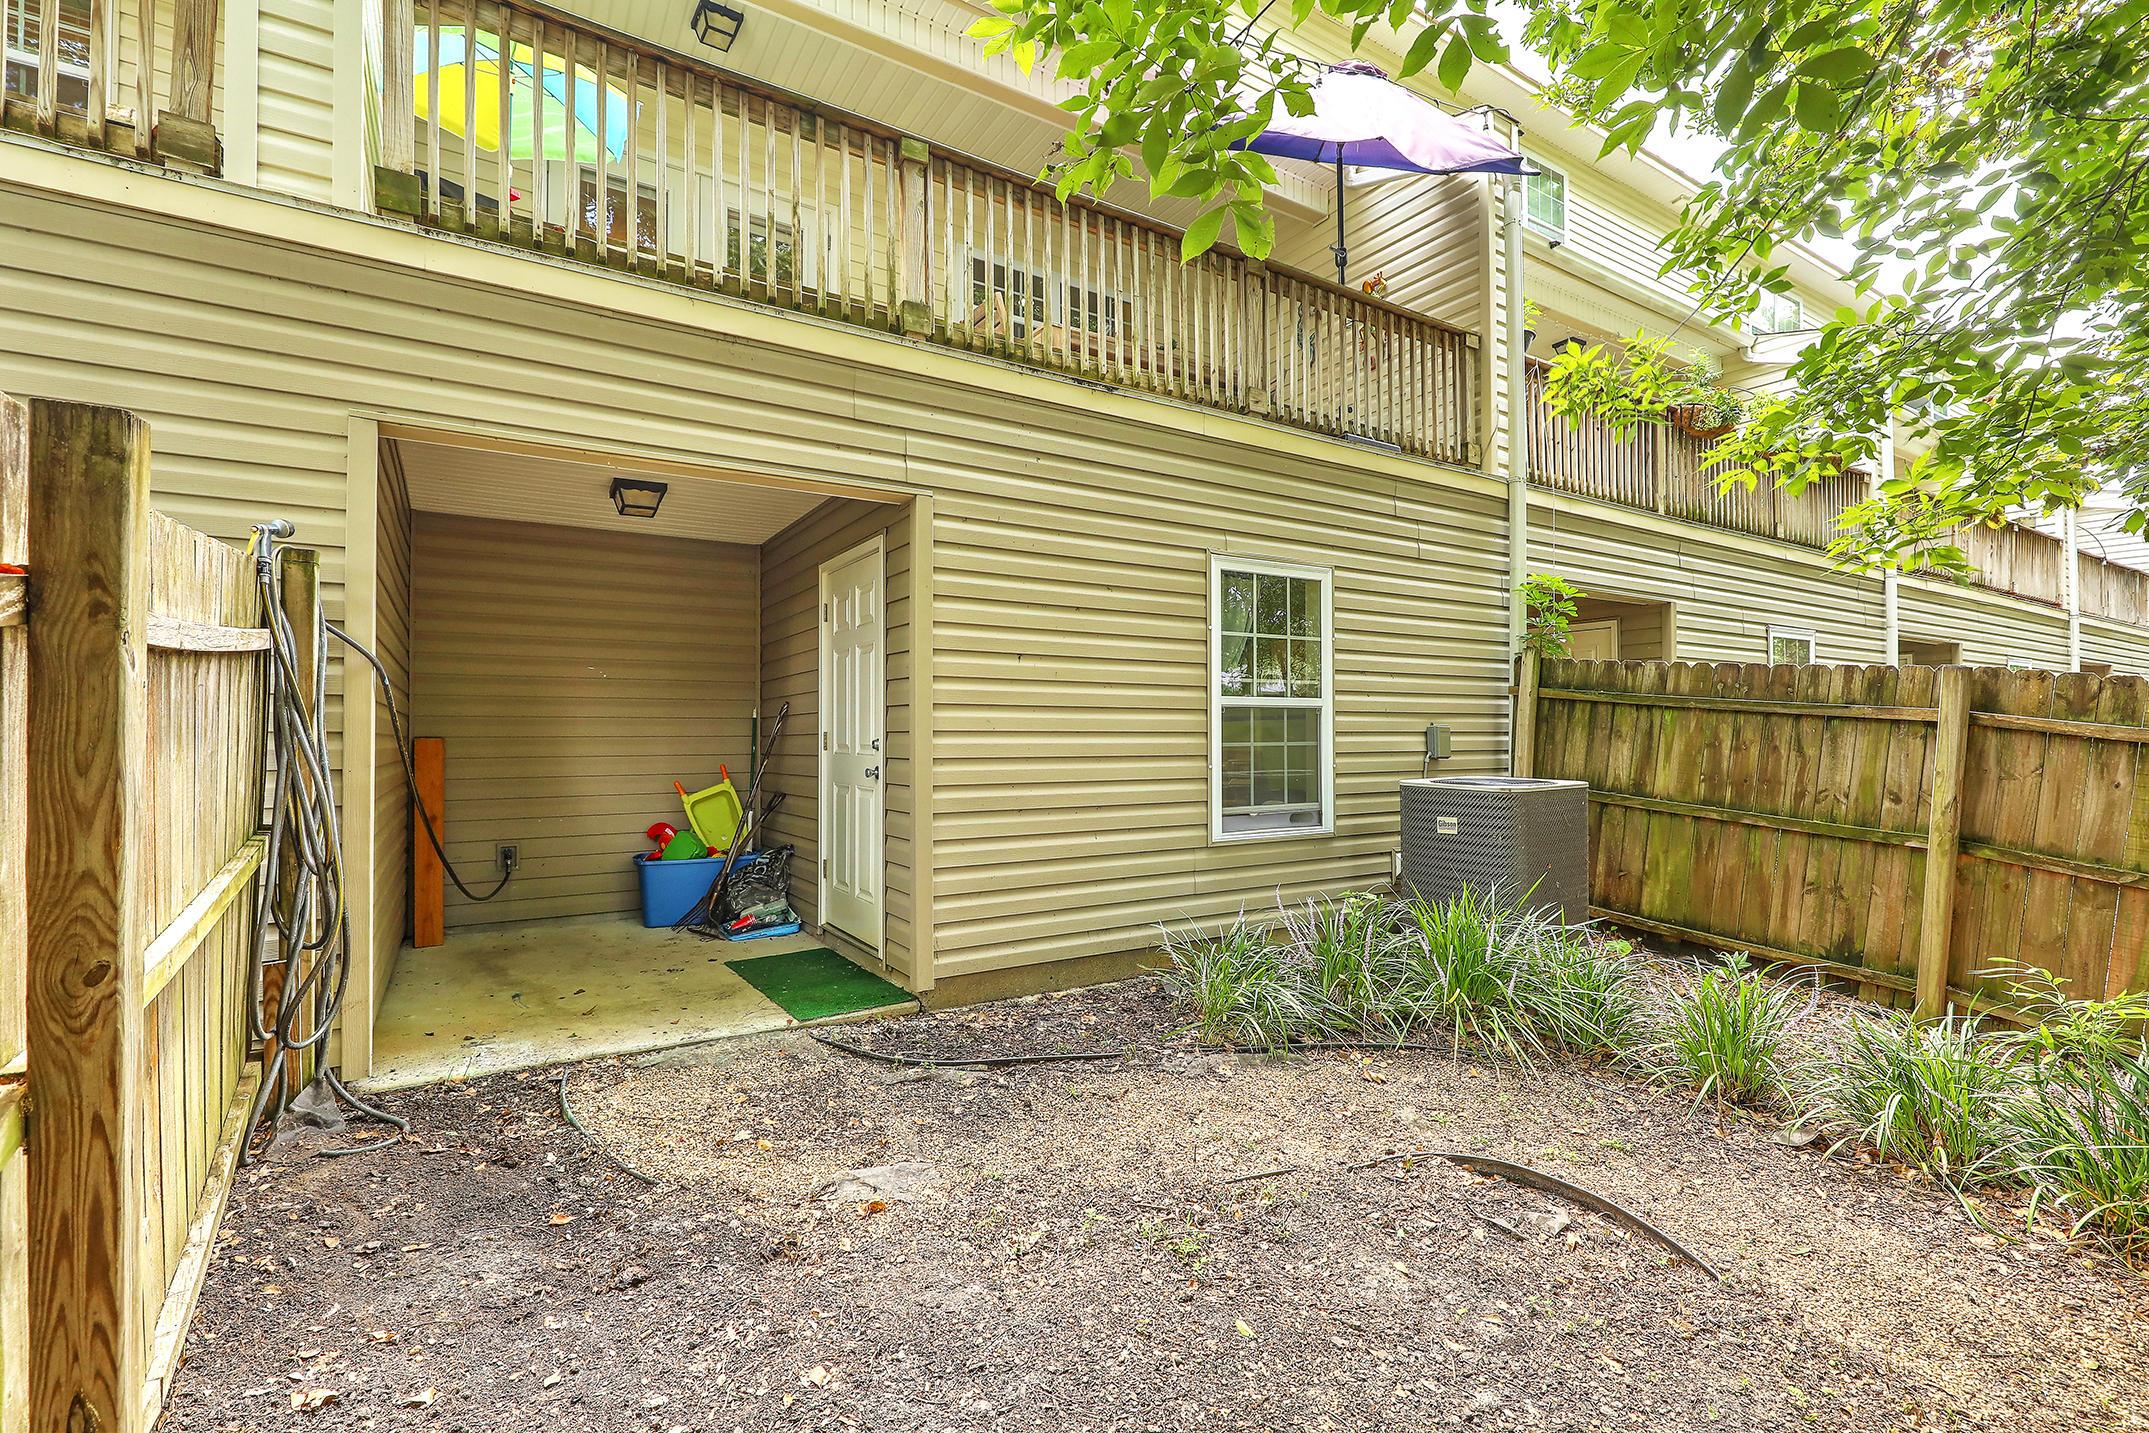 Ashley Park Homes For Sale - 4025 Hartland, Charleston, SC - 1